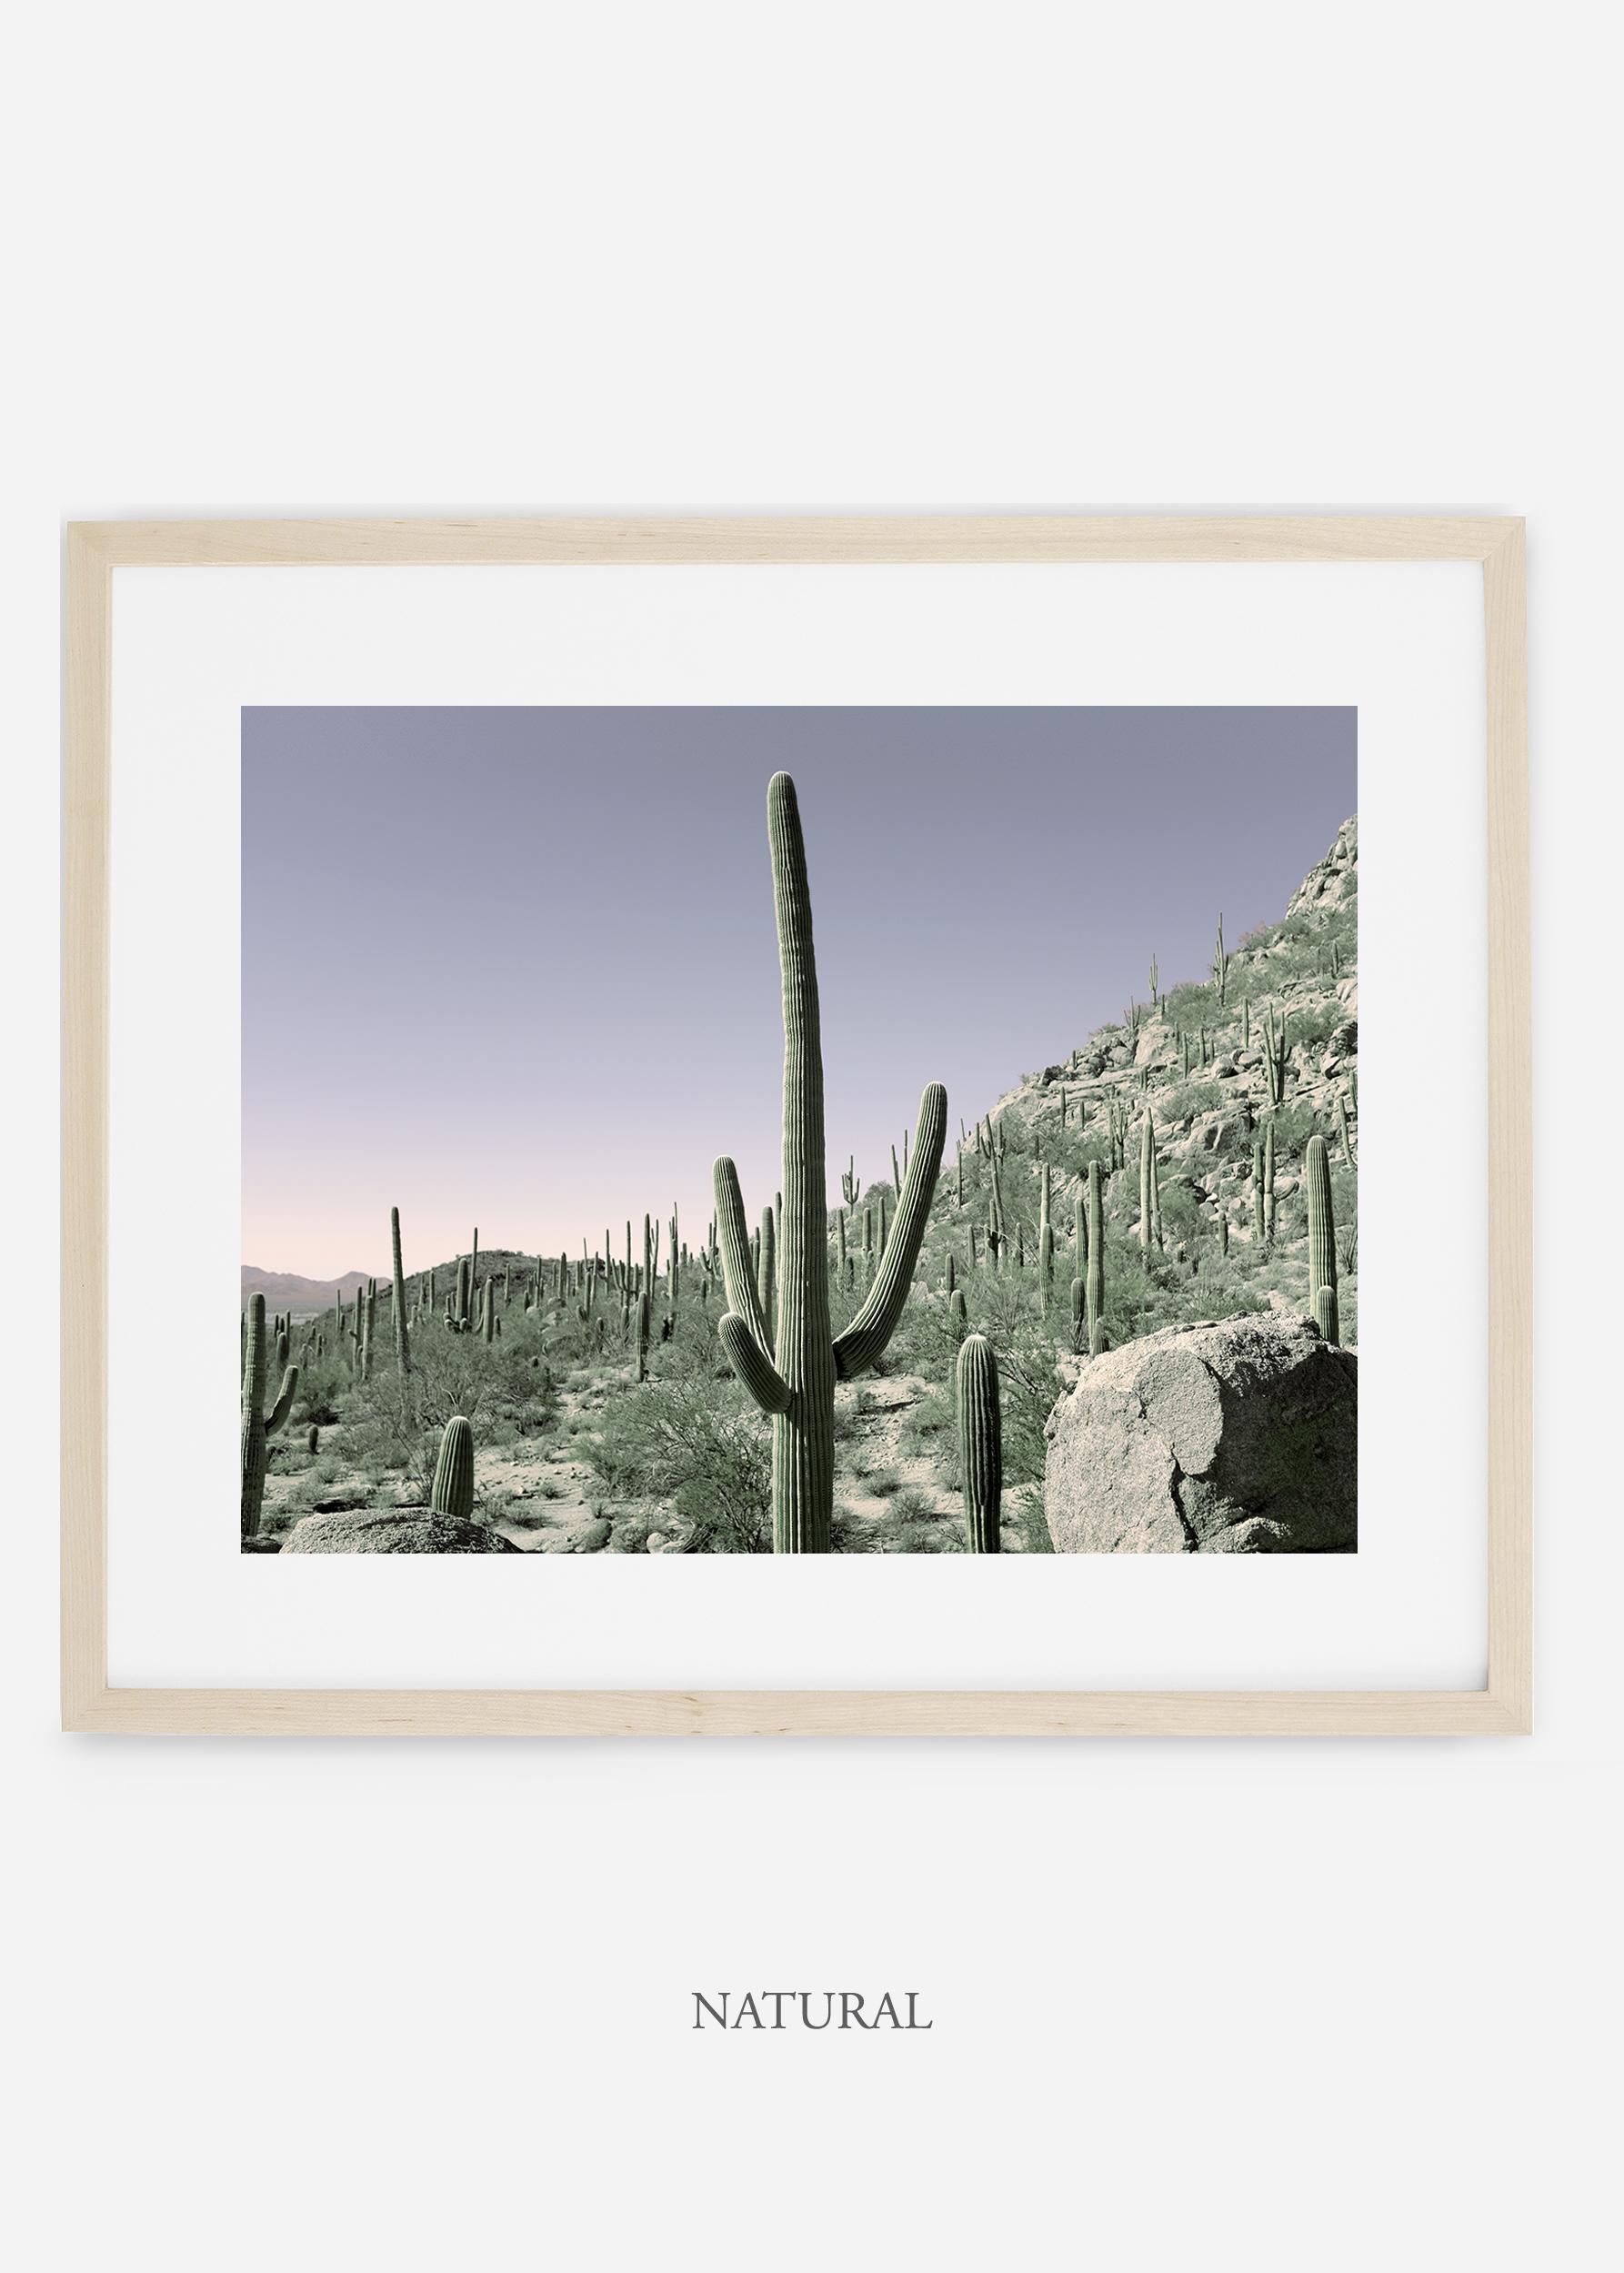 naturalframe-saguaroNo.11-wildercalifornia-art-wallart-cactusprint-homedecor-prints-arizona-botanical-artwork-interiordesign.jpg